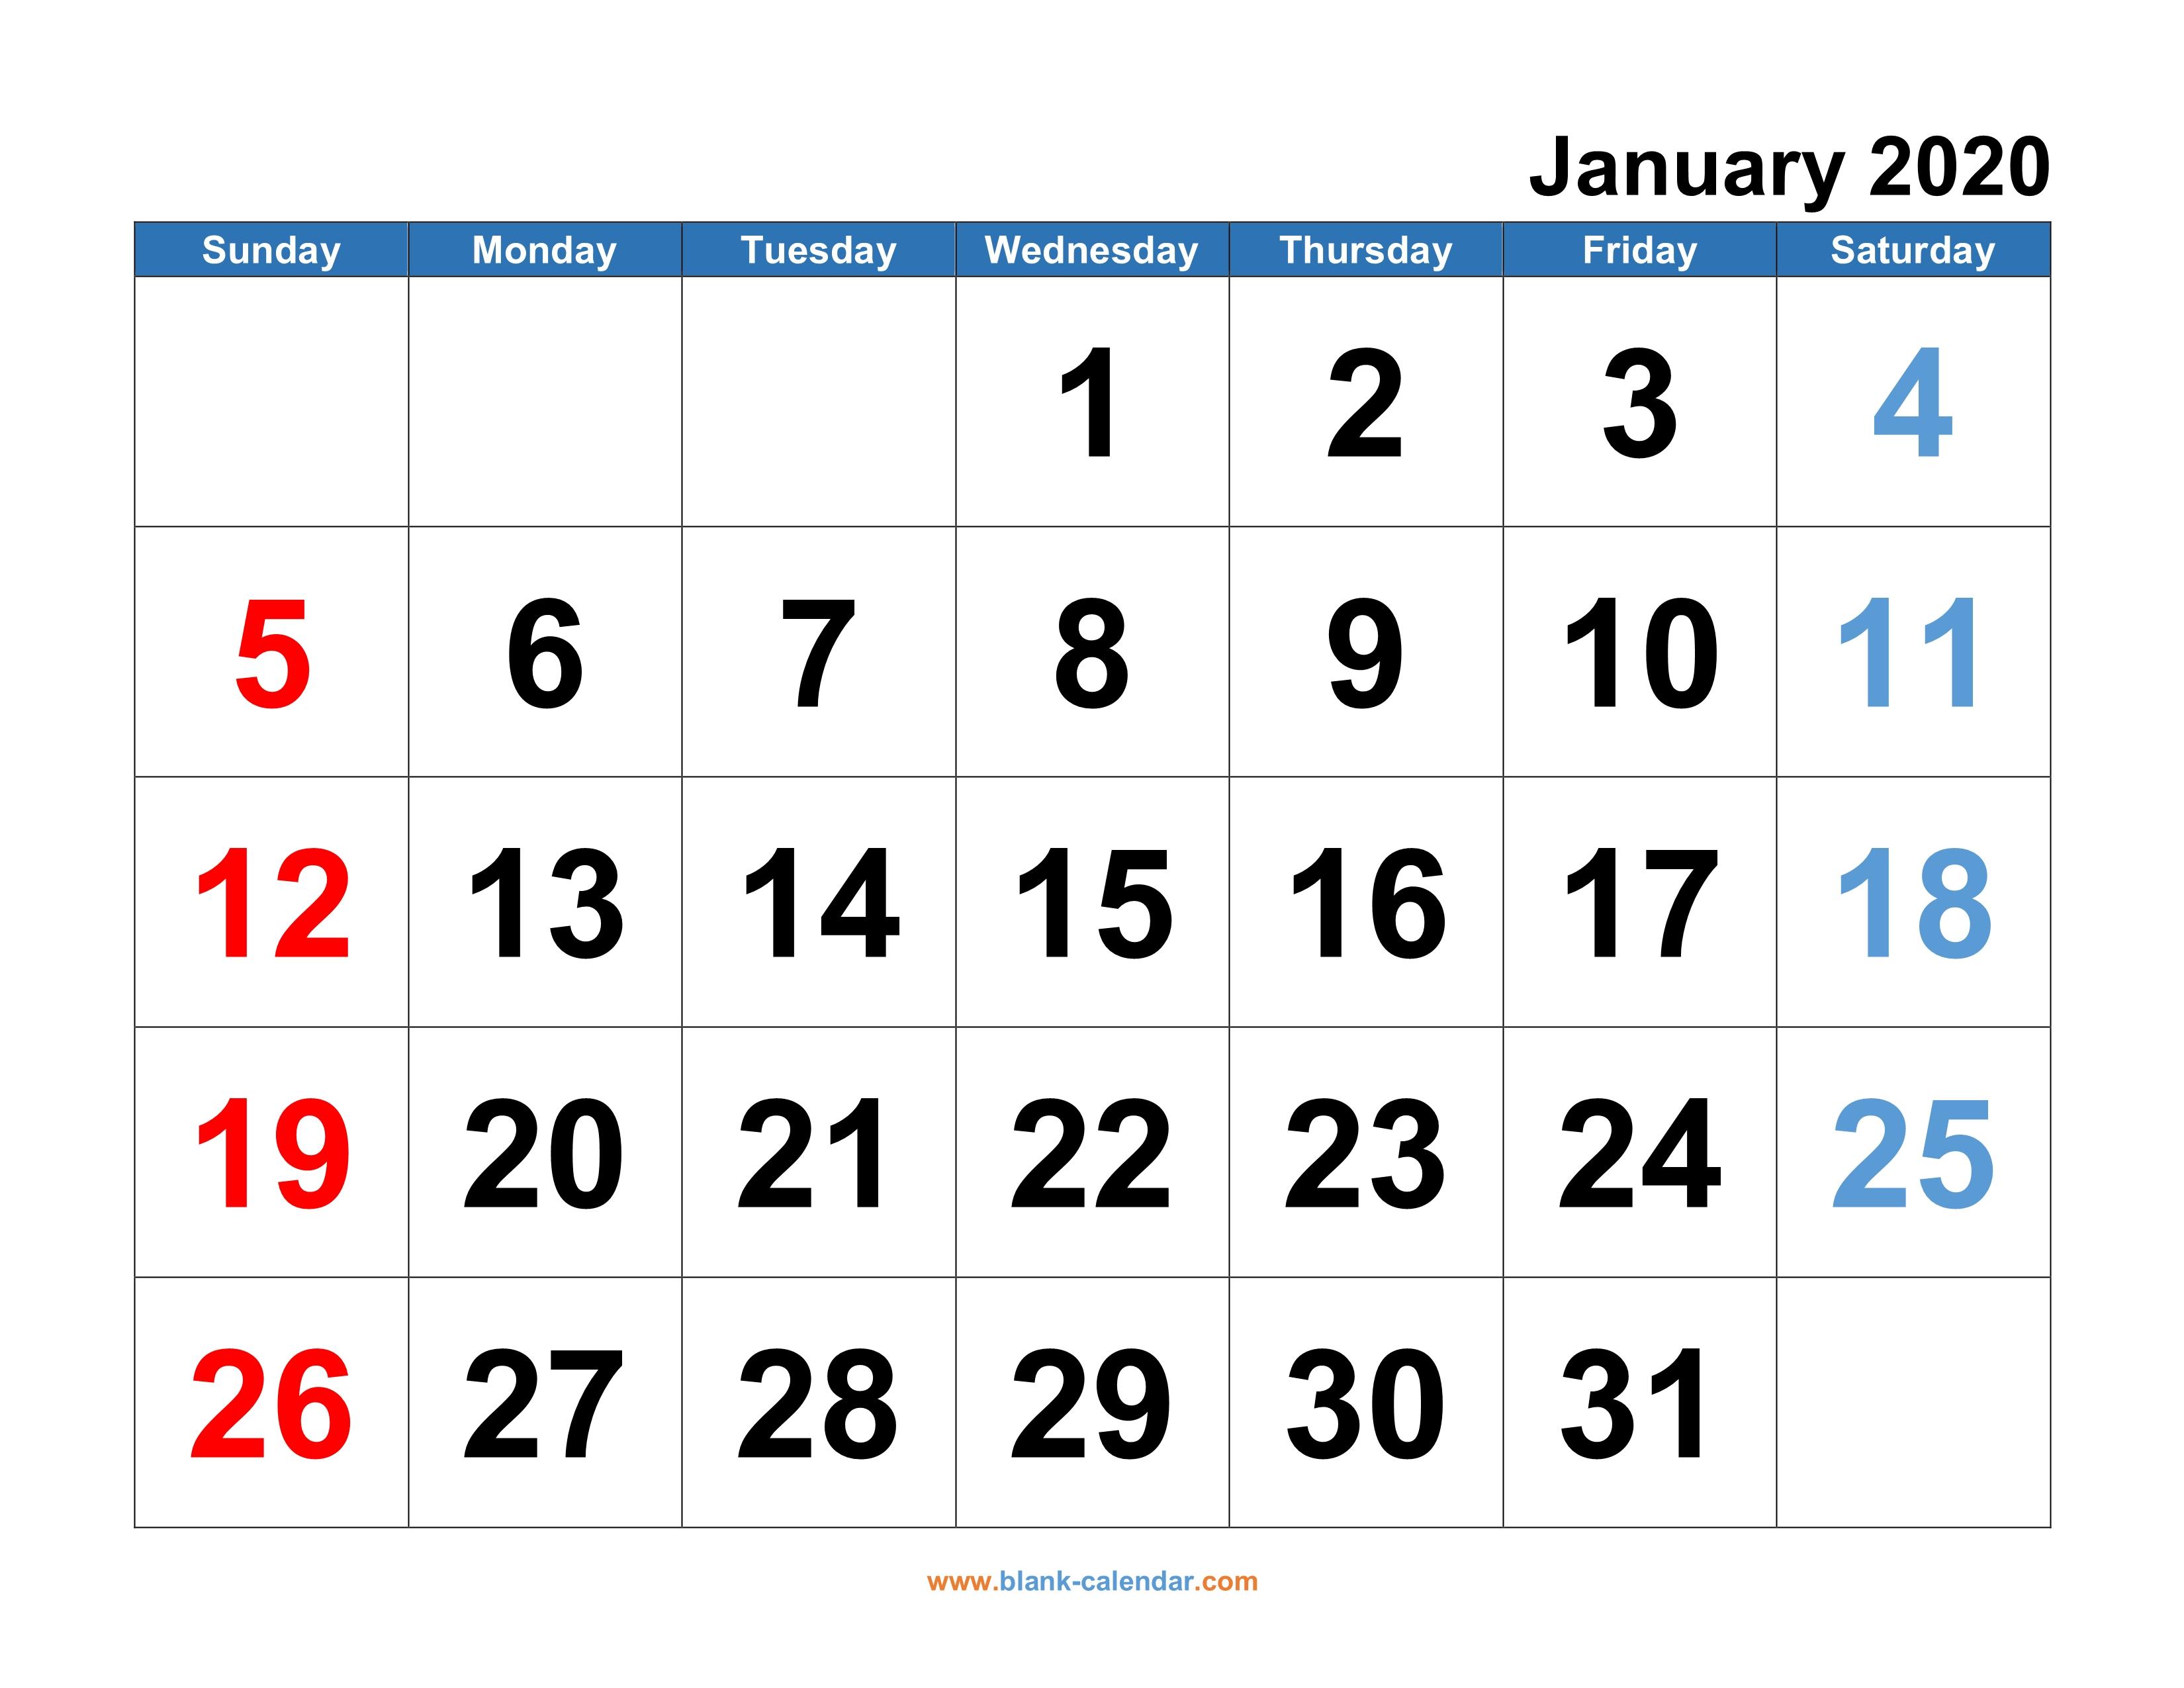 Monthly Calendar Printable 2020 - Wpa.wpart.co regarding Large Numbers Free Printable Calendar 2020